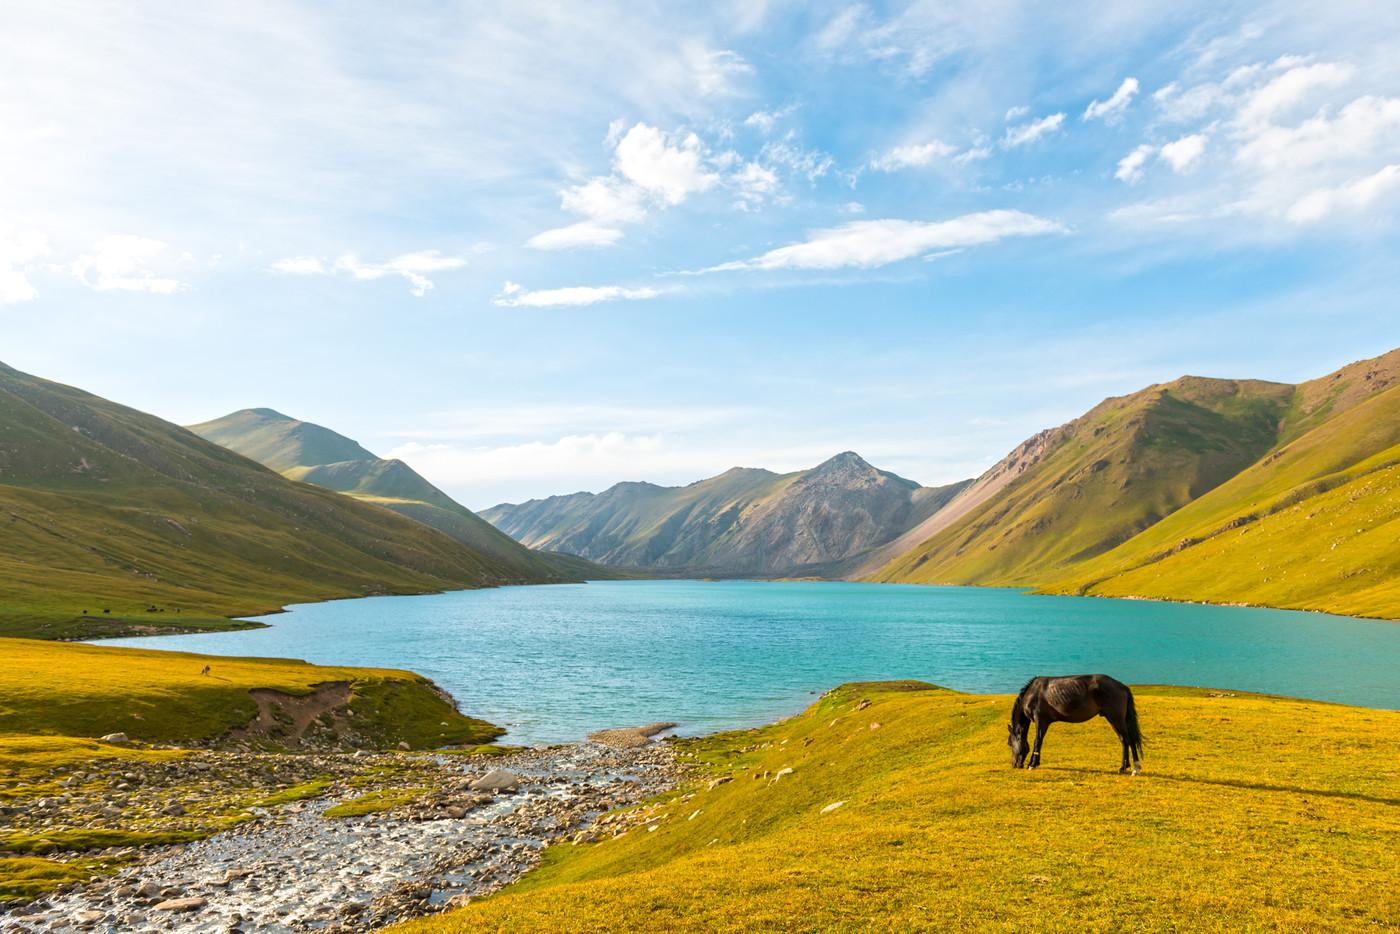 Lake Kol-Ukok,Kyrgyzstan